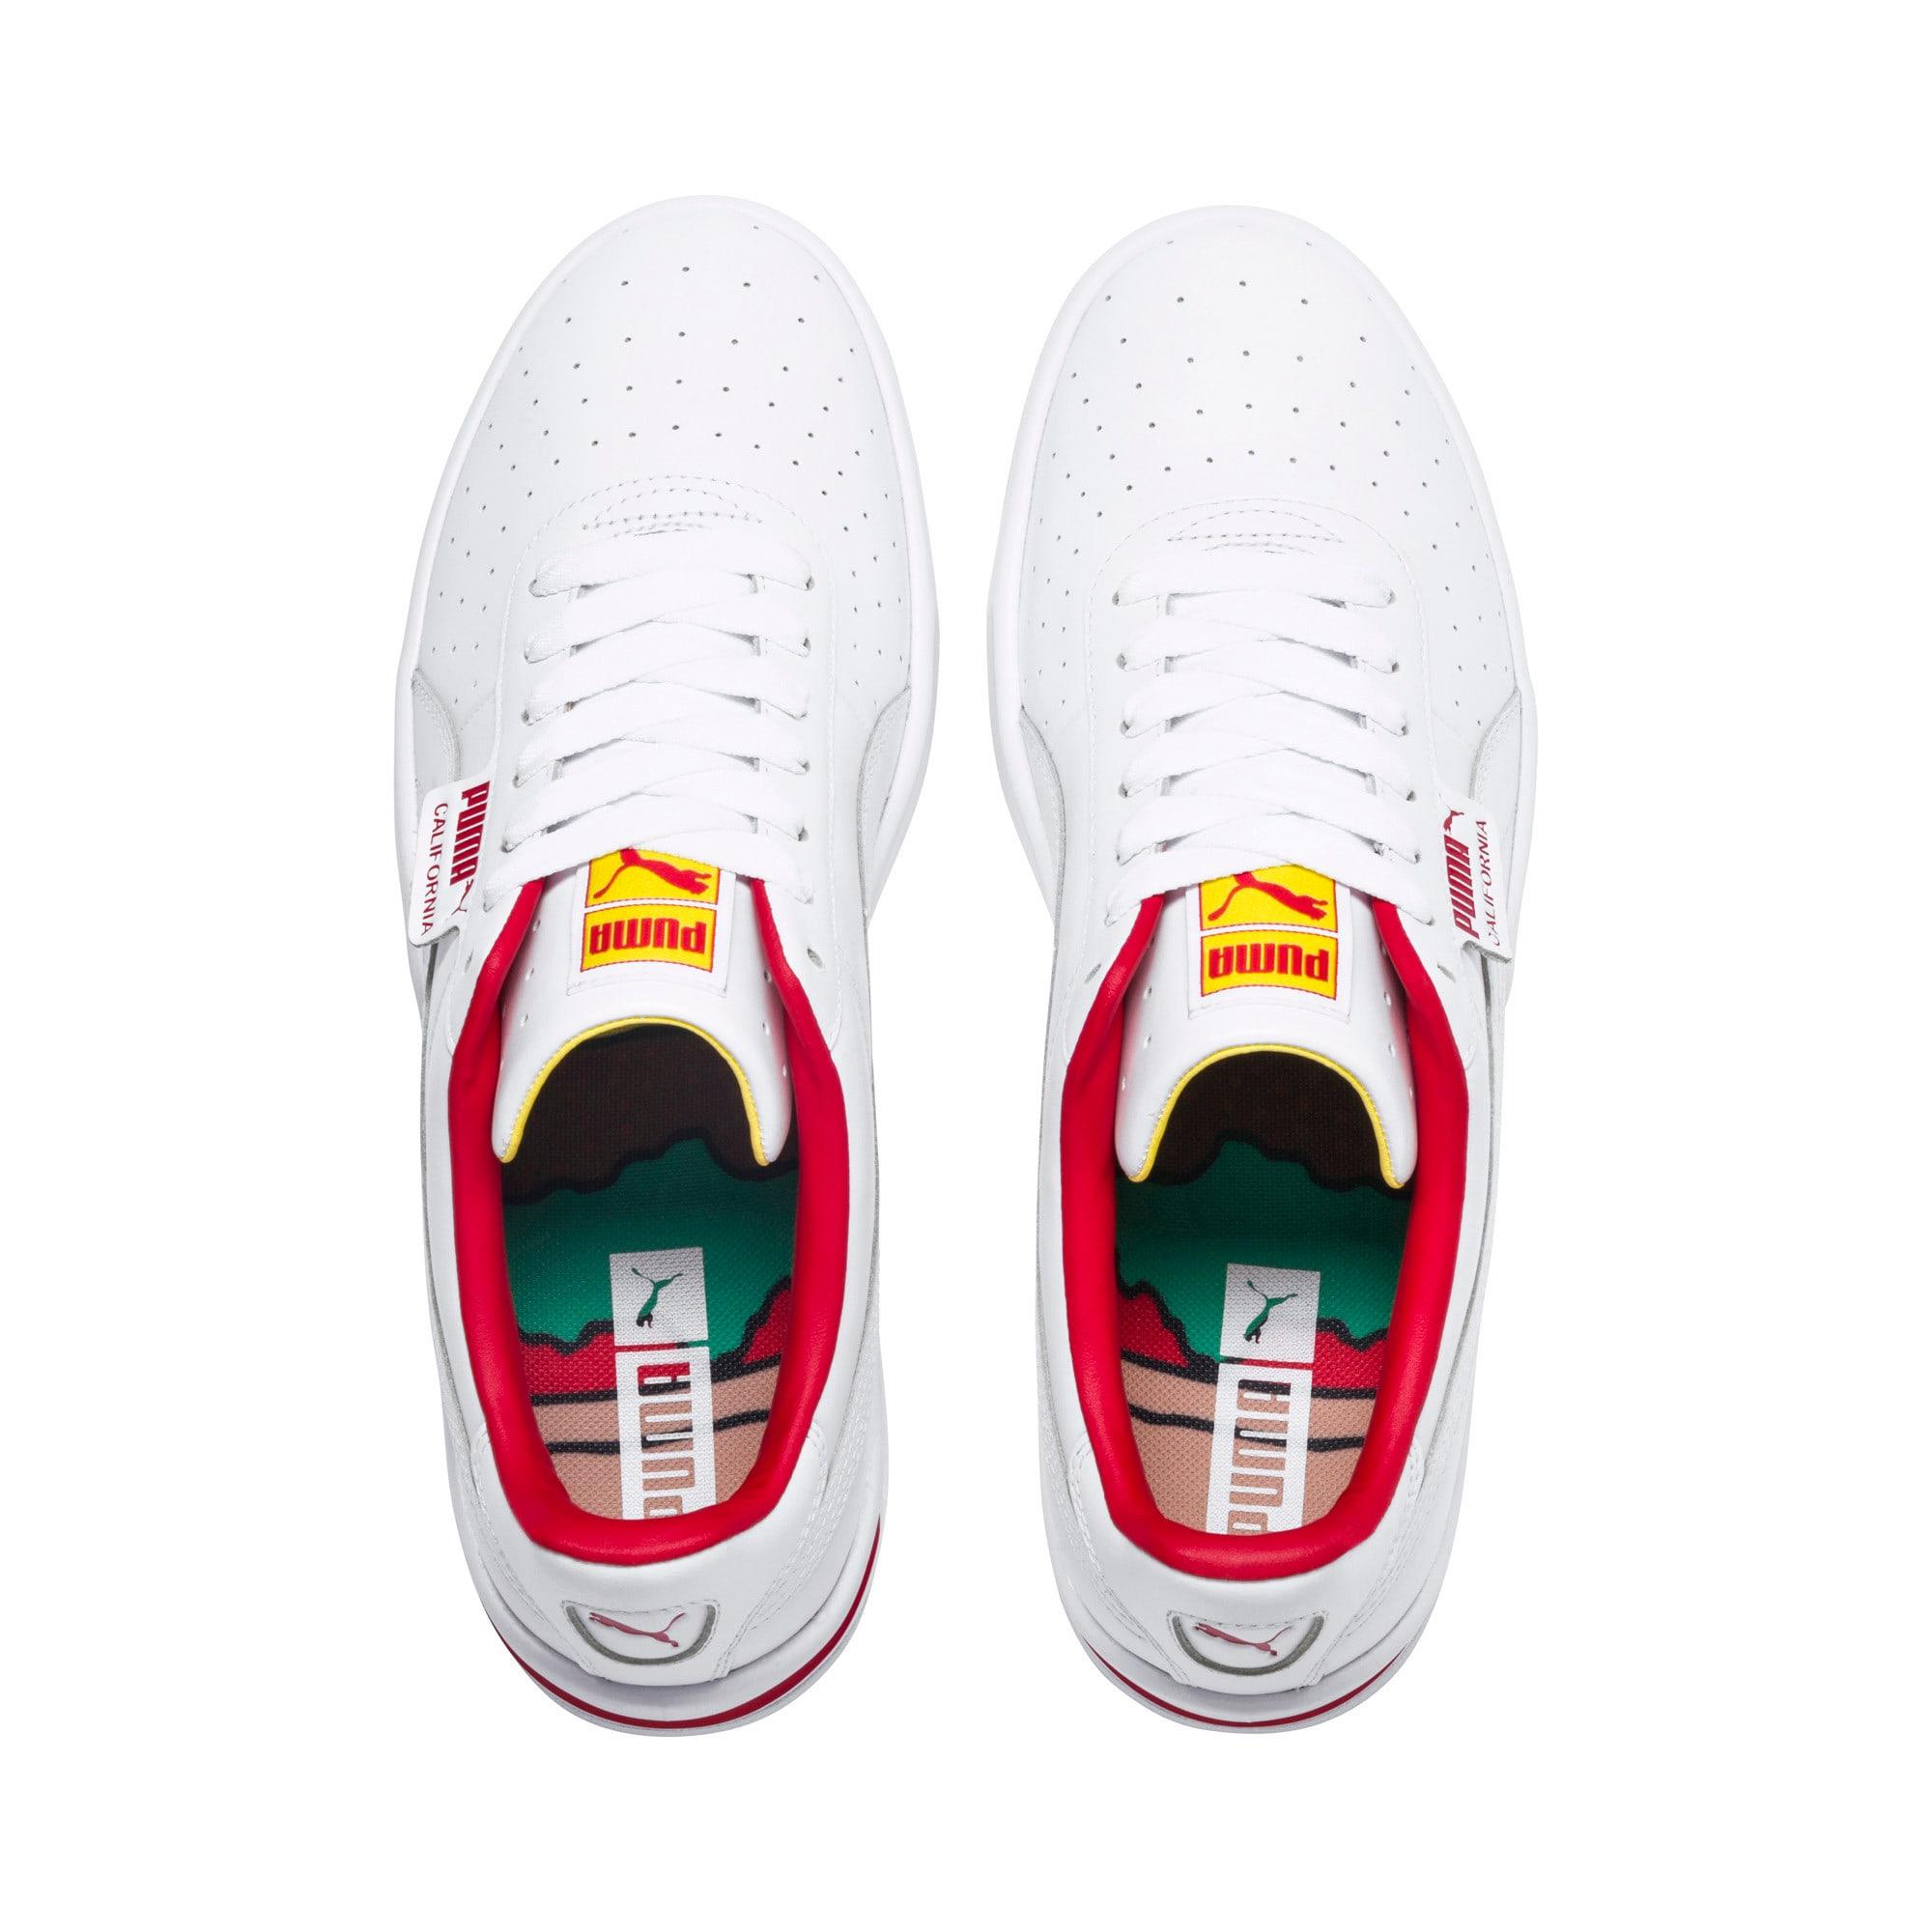 Thumbnail 7 of California Drive Thru Shoes, P Wht-HighRiskRed-Blazg Yelw, medium